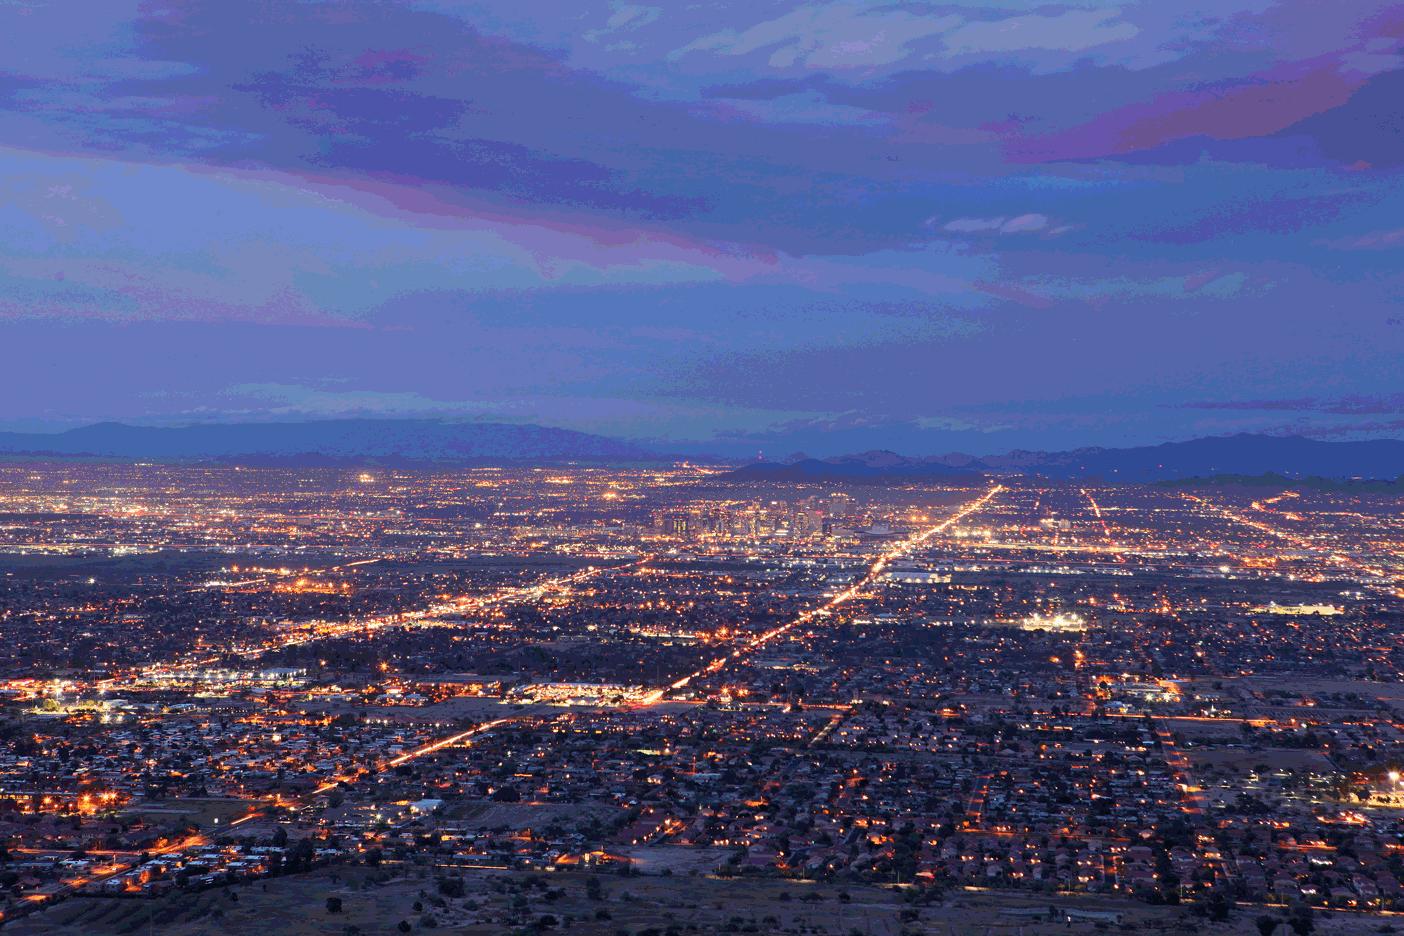 phoenix-at-night